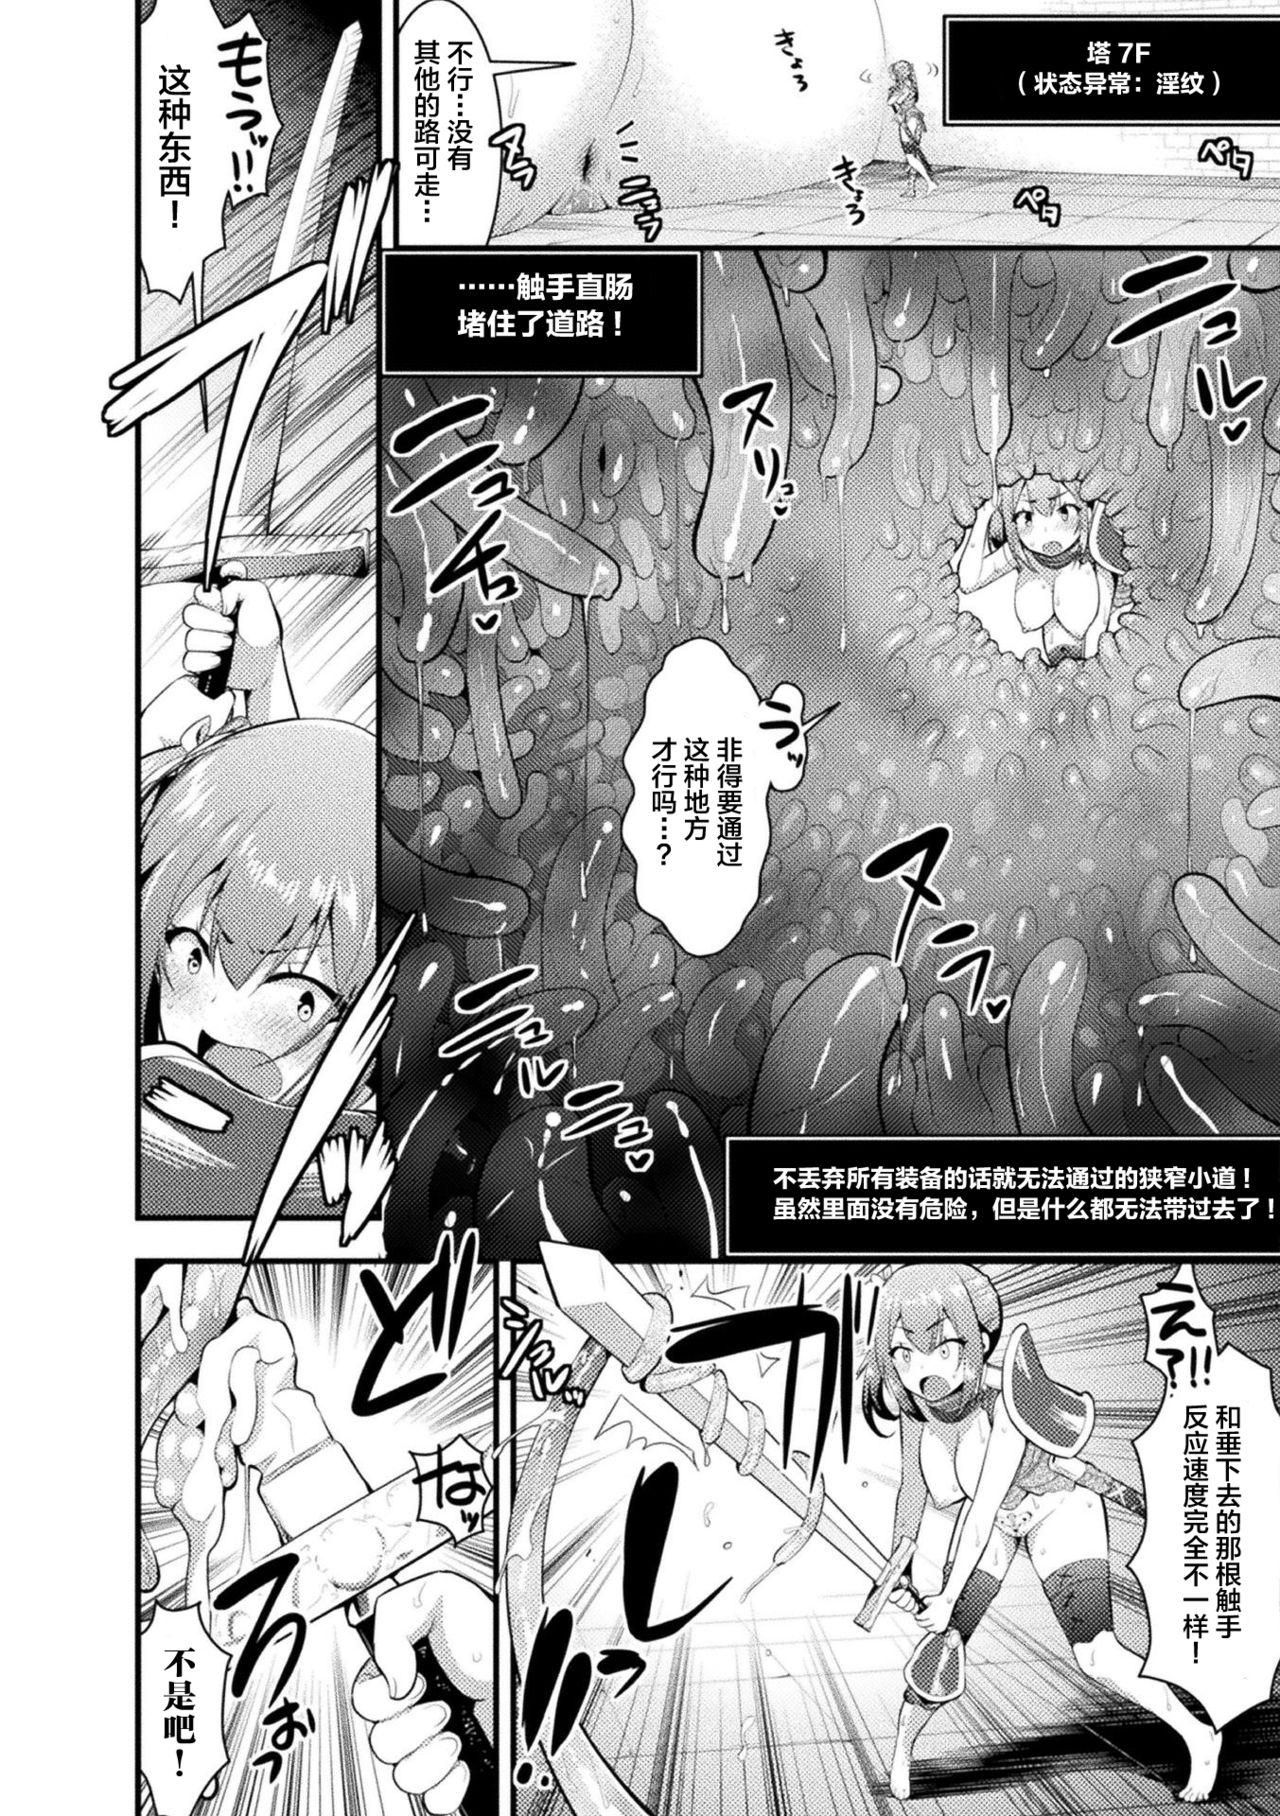 2D Comic Magazine Zecchou Kairaku ga Tomaranai Ero-Trap Dungeon Vol. 1 49